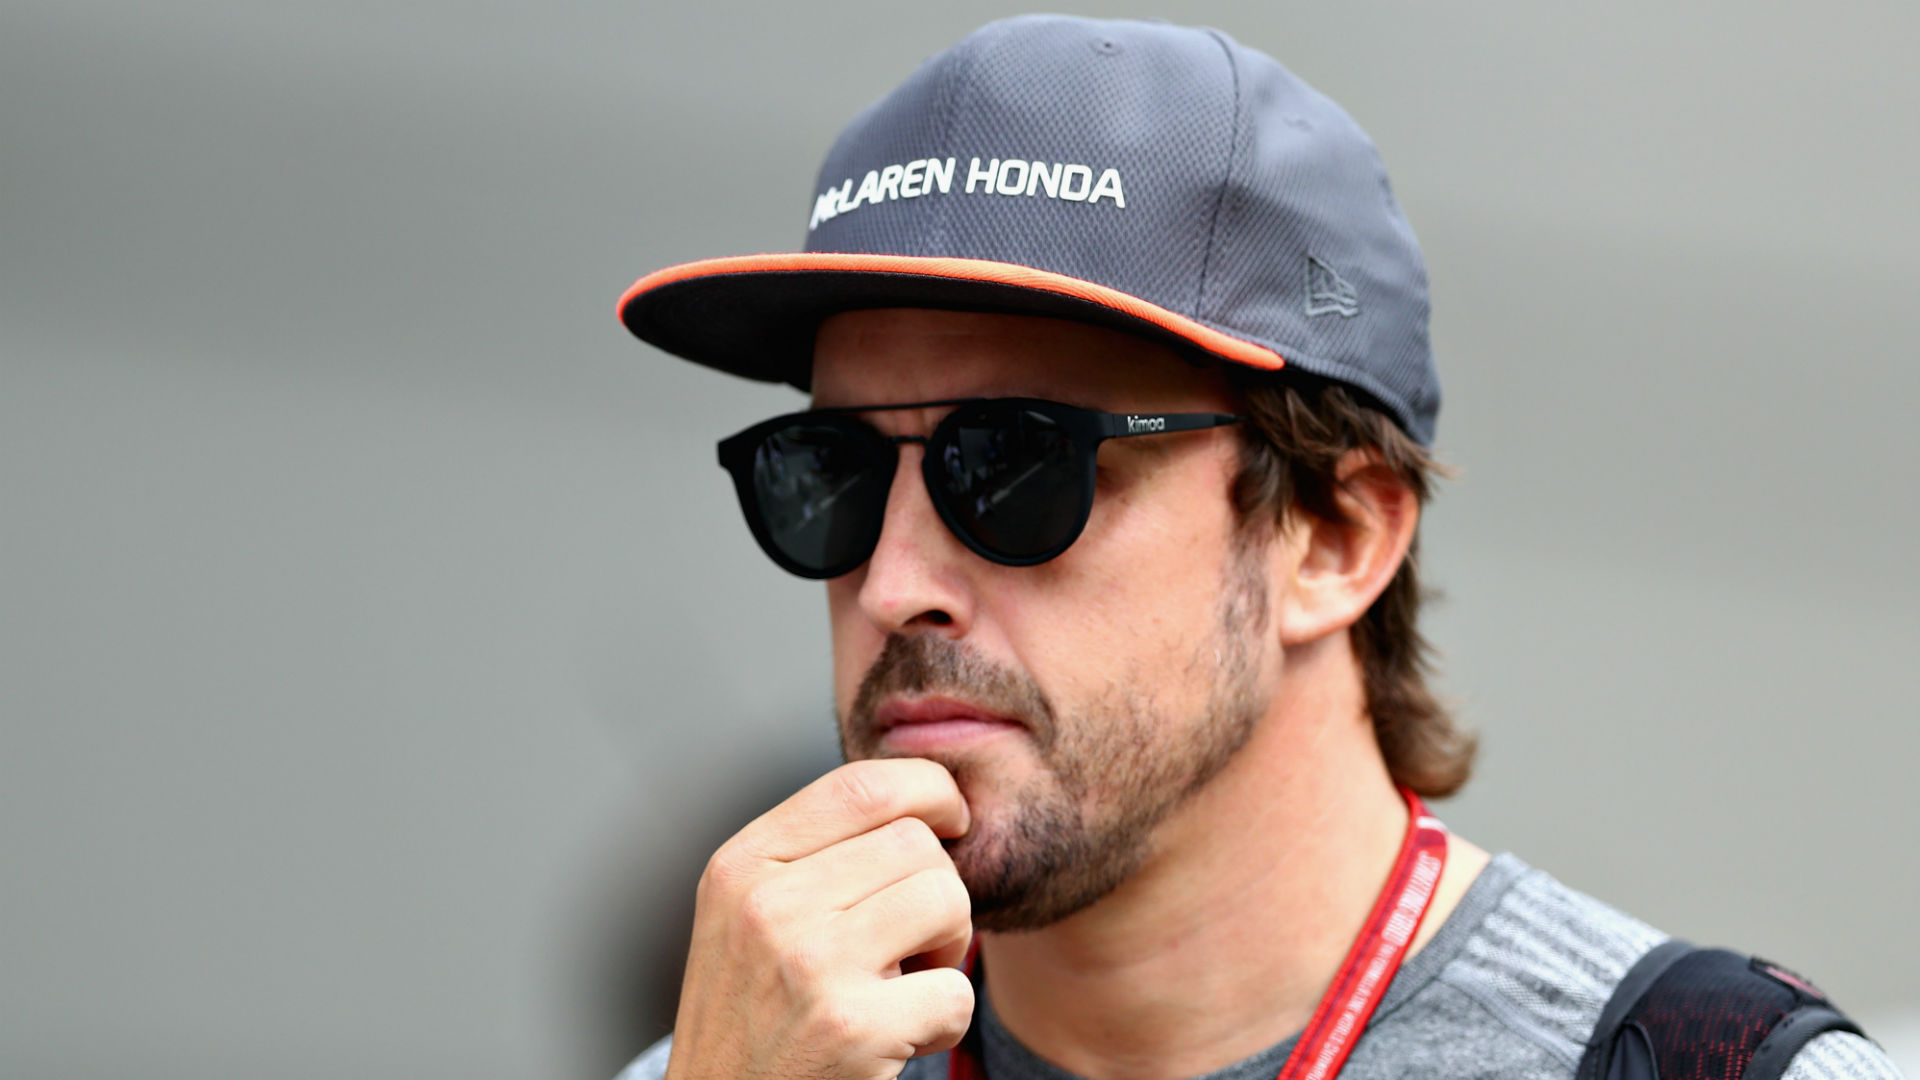 NASCAR invites Fernando Alonso to race in Daytona 500